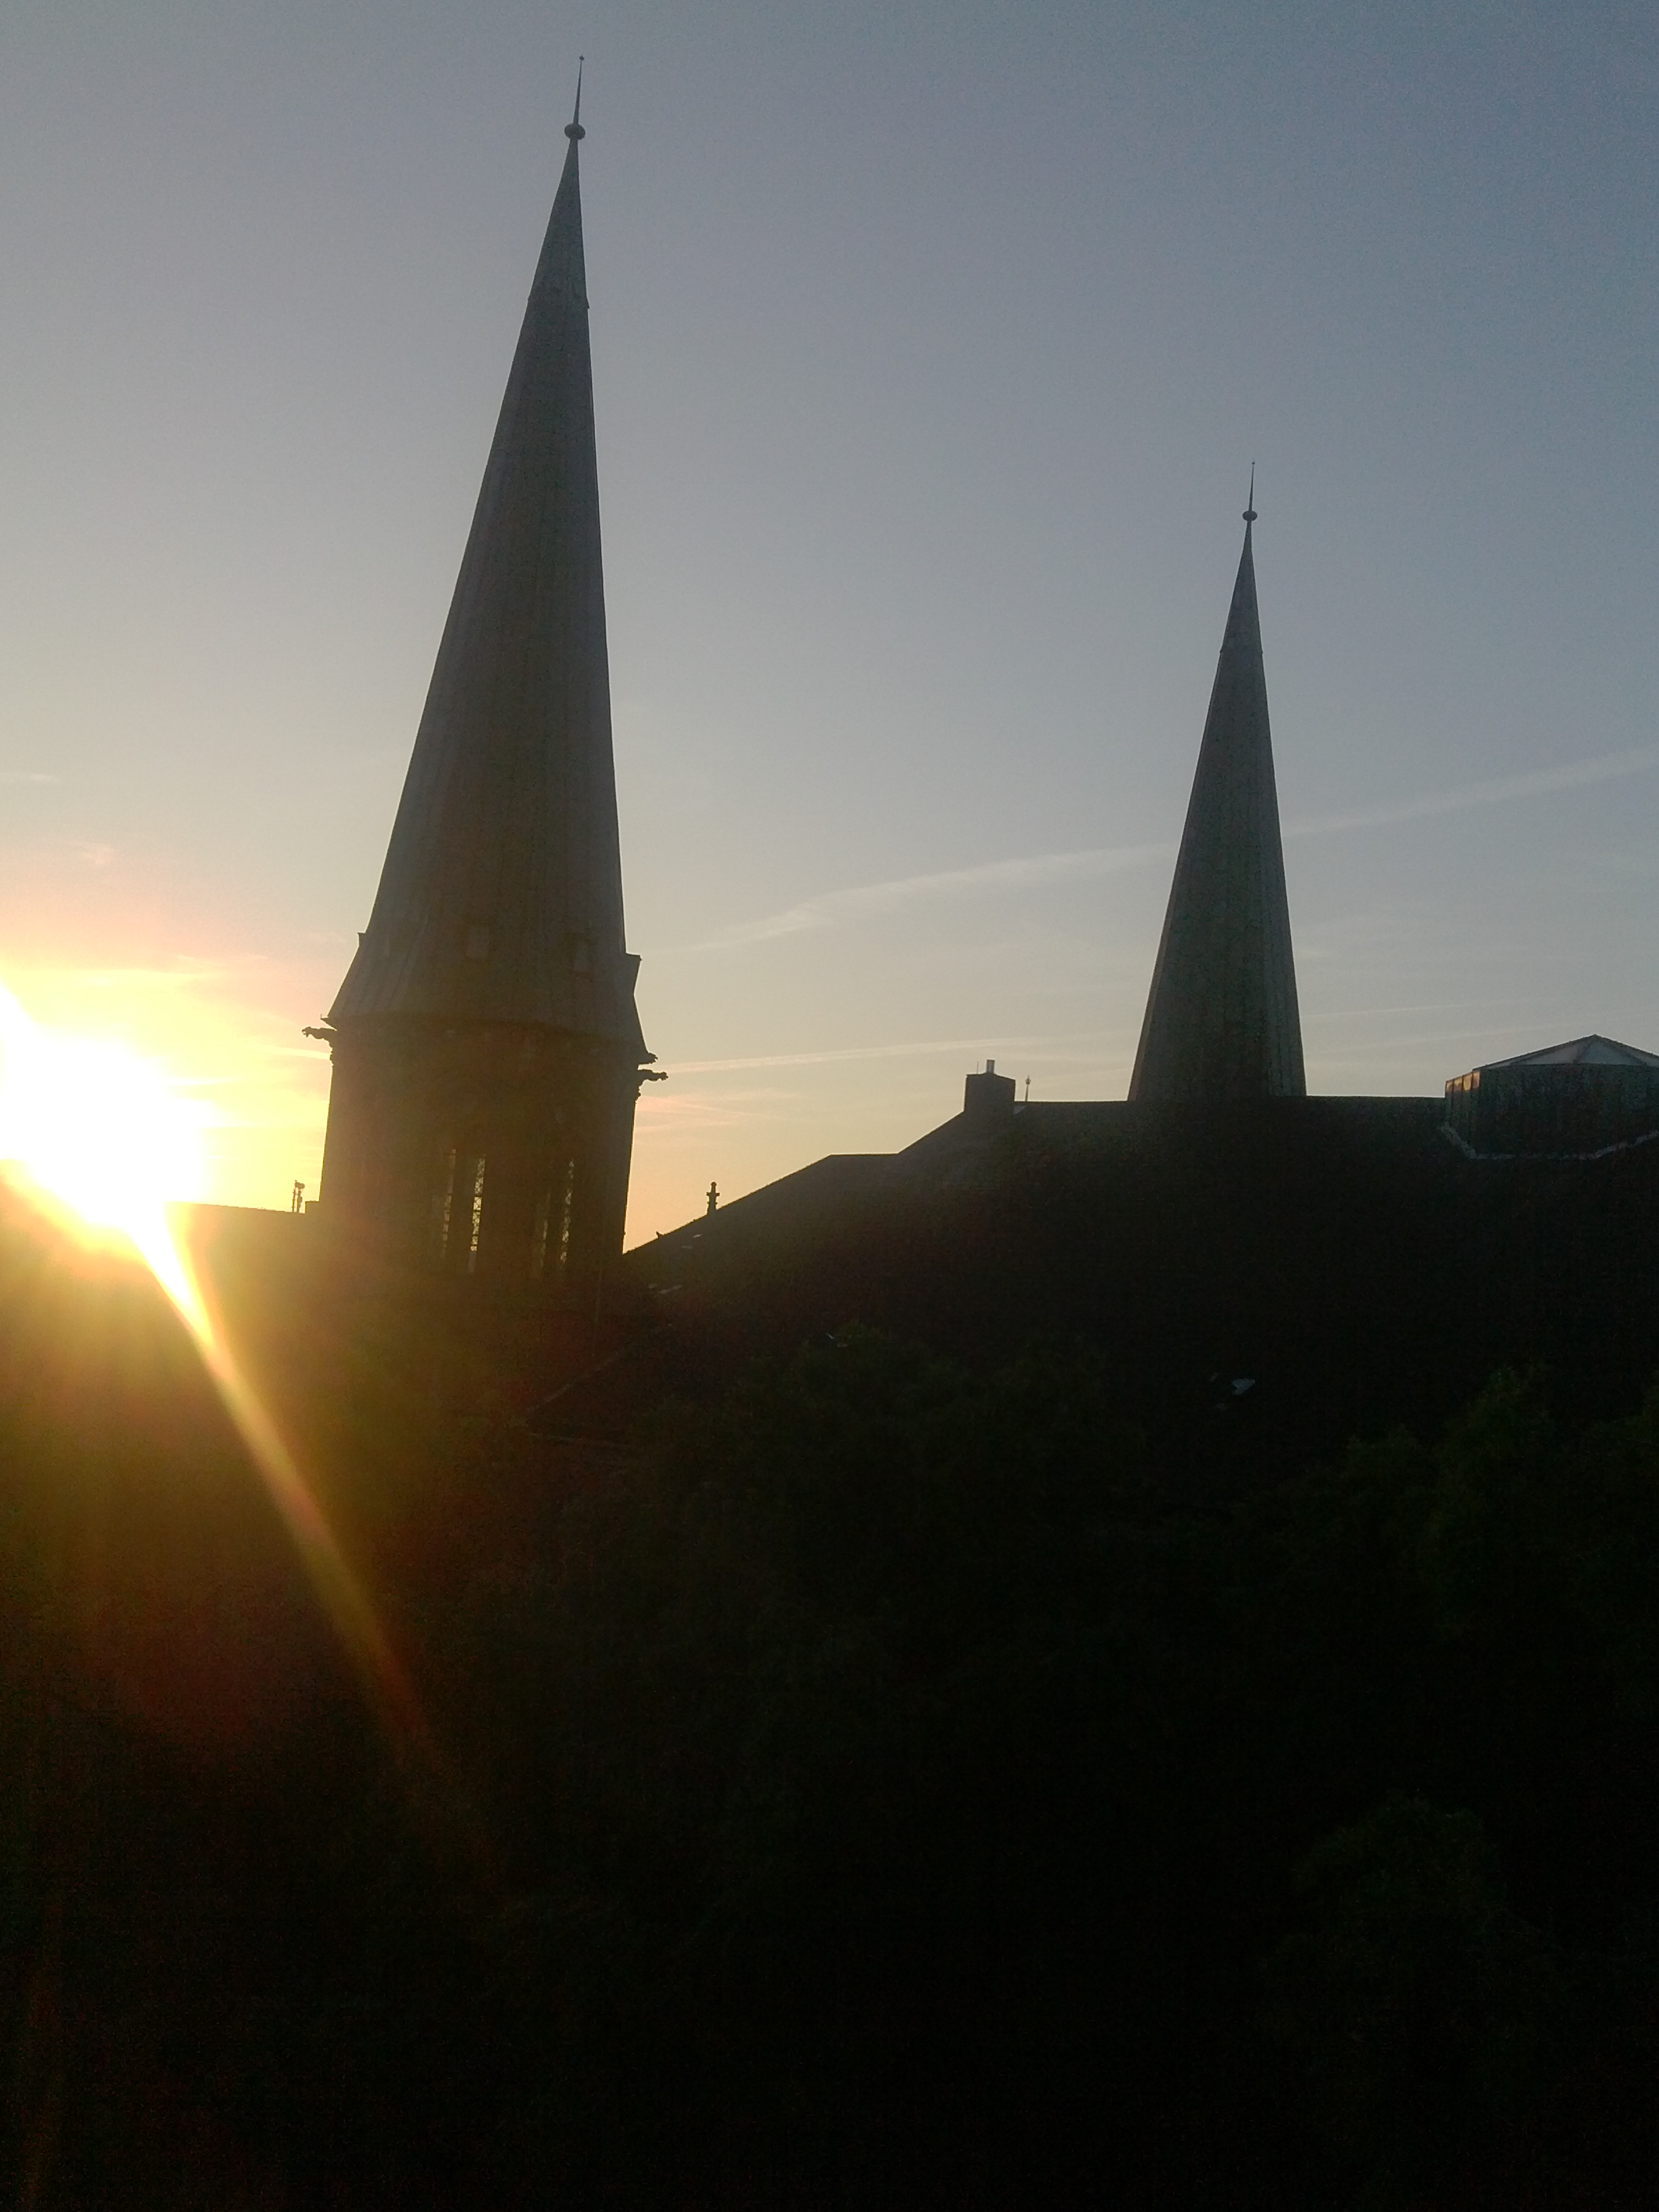 Sonnenaufgang über der Lambertikirche